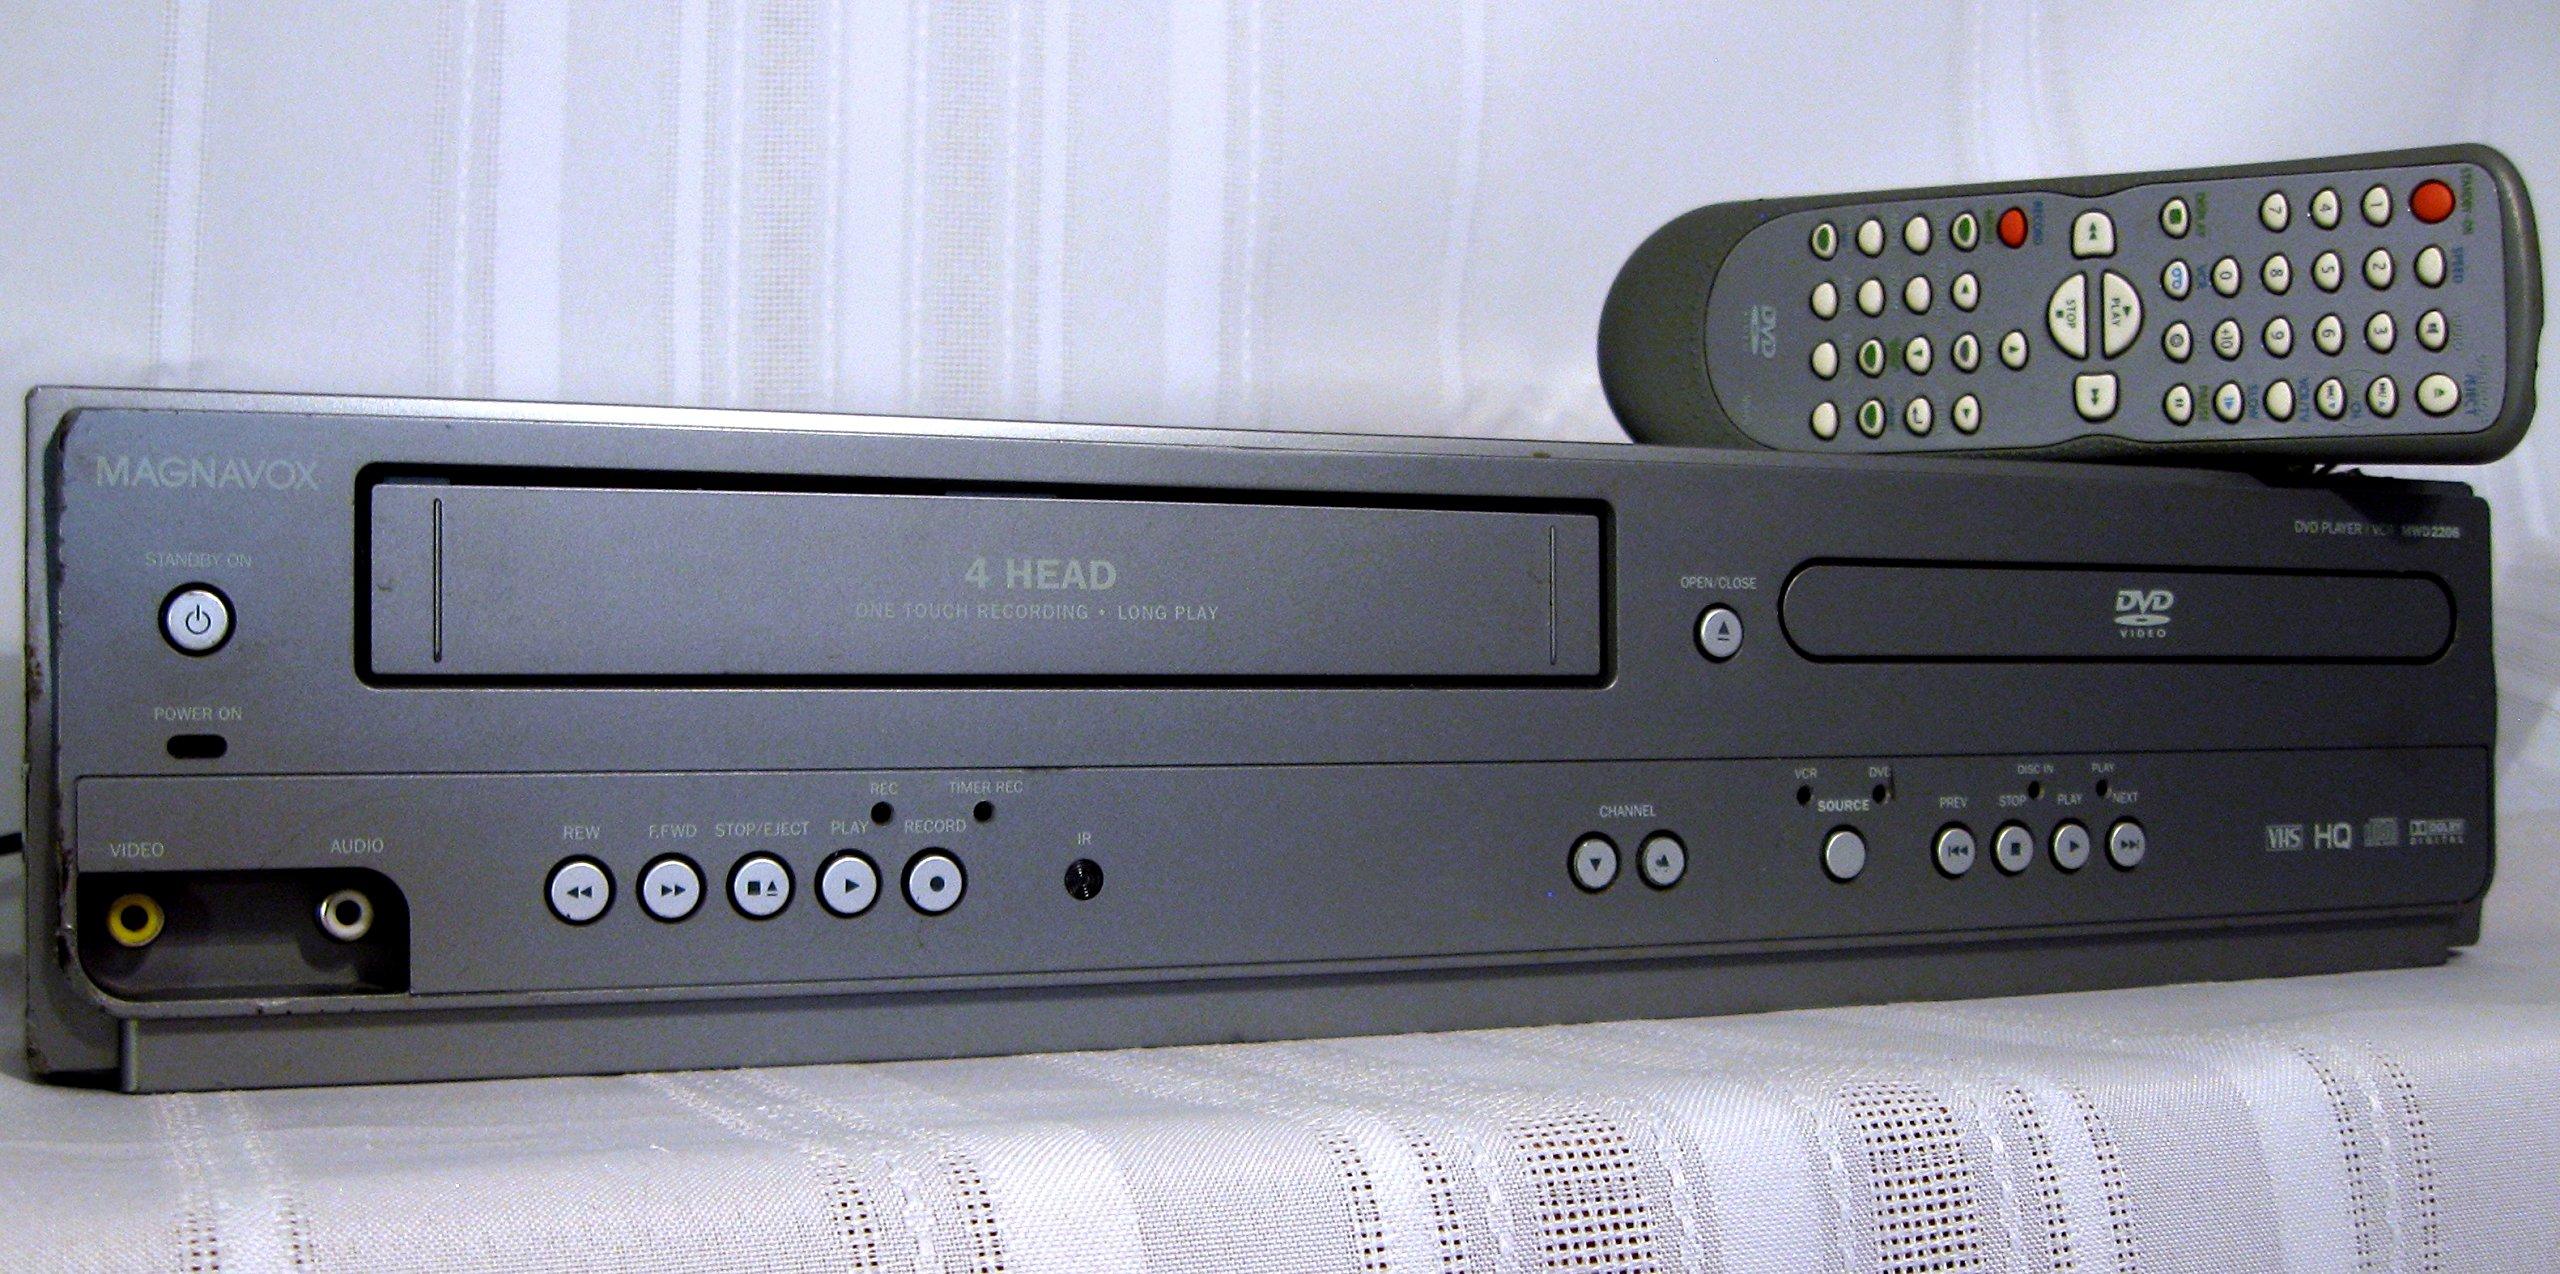 Magnavox DVD/VCR Dual Deck, MWD2206